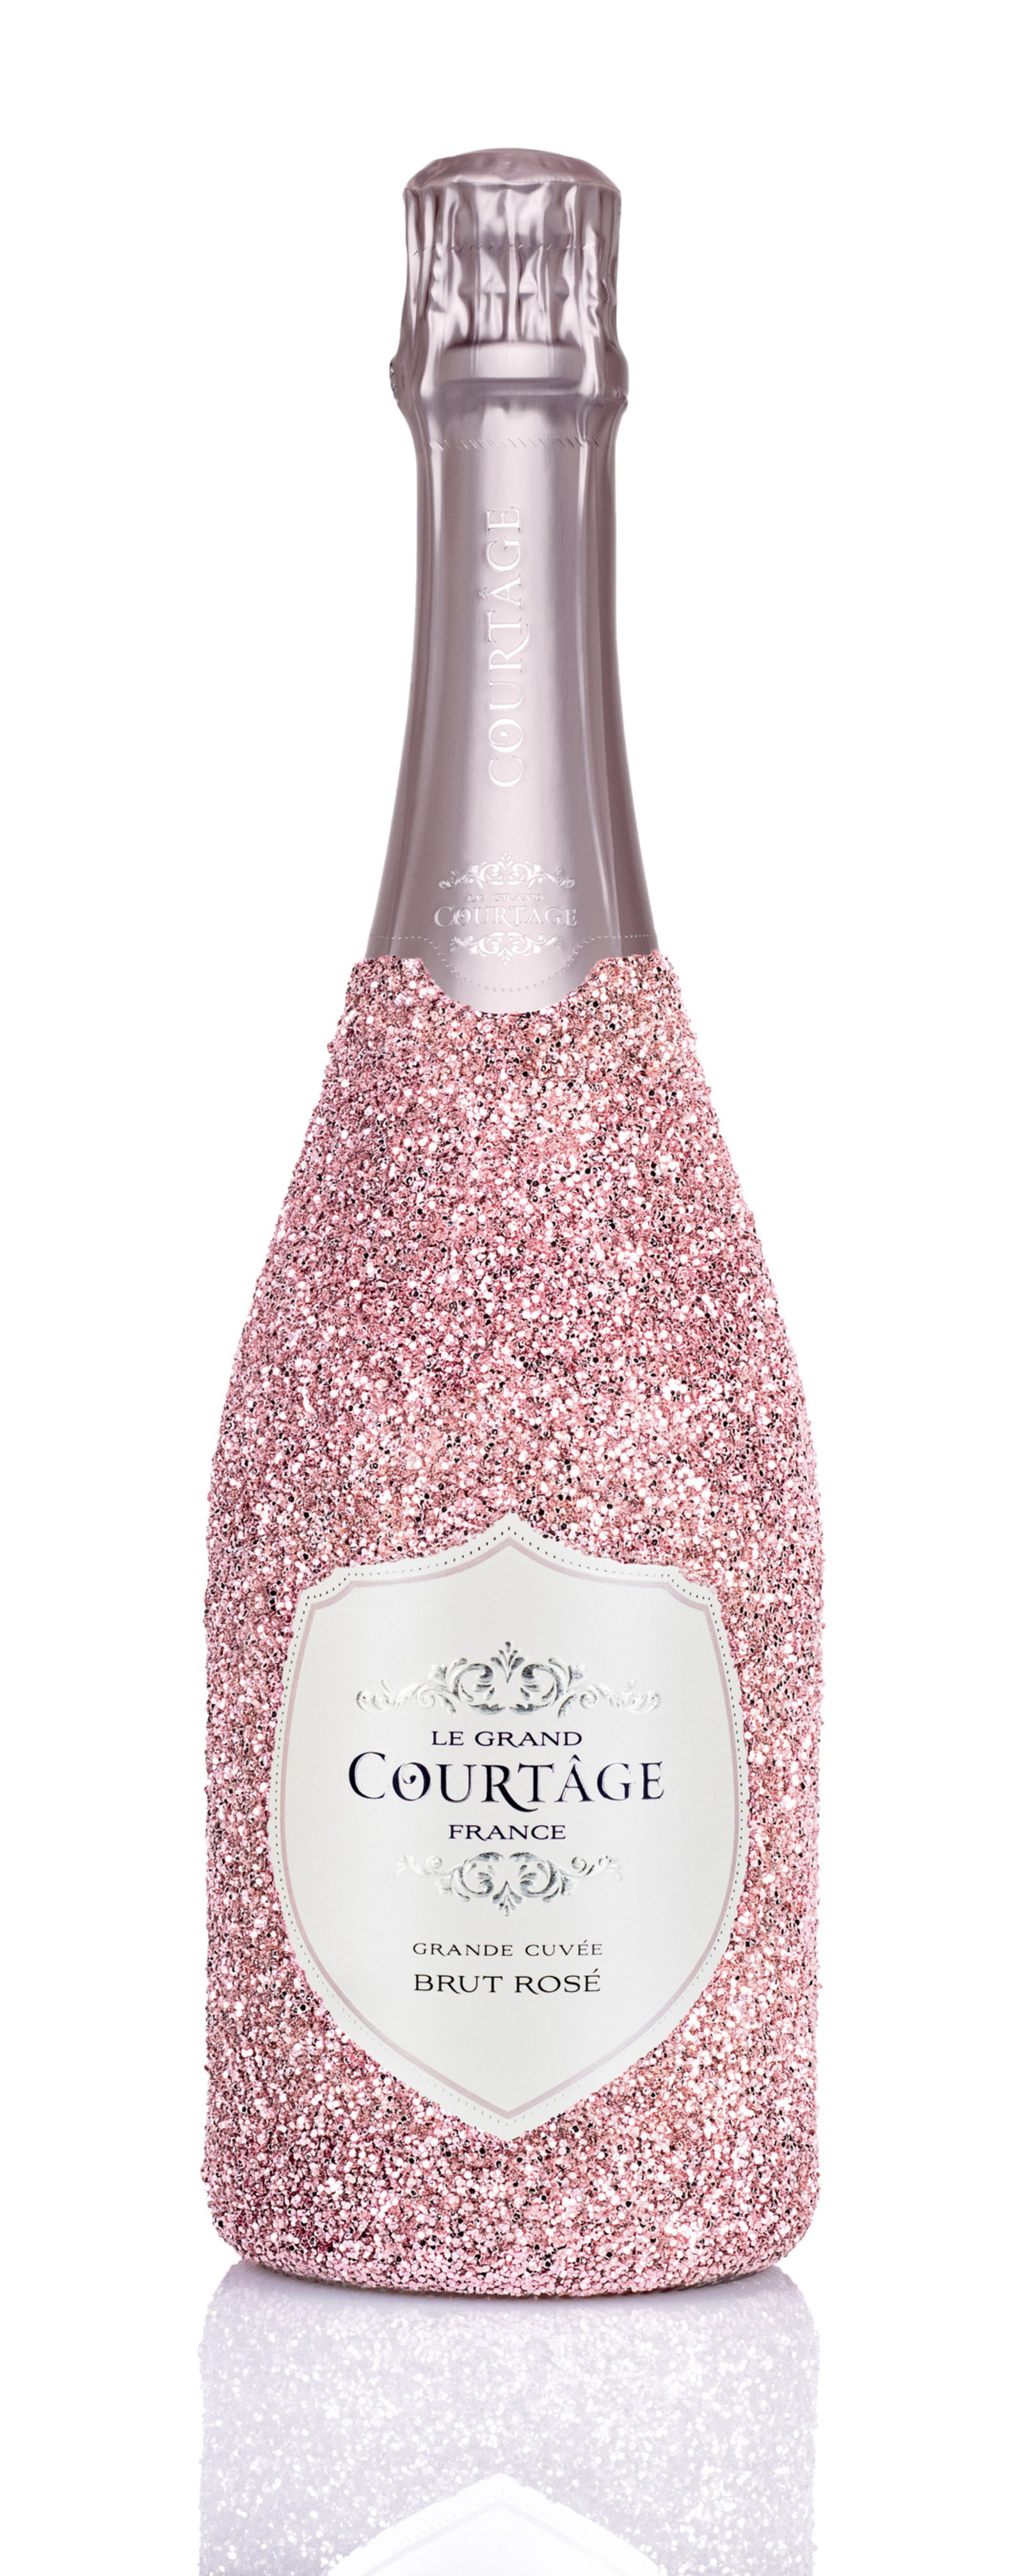 Le Grand Courtâge Releases Limited Edition Bedazzled Bottle